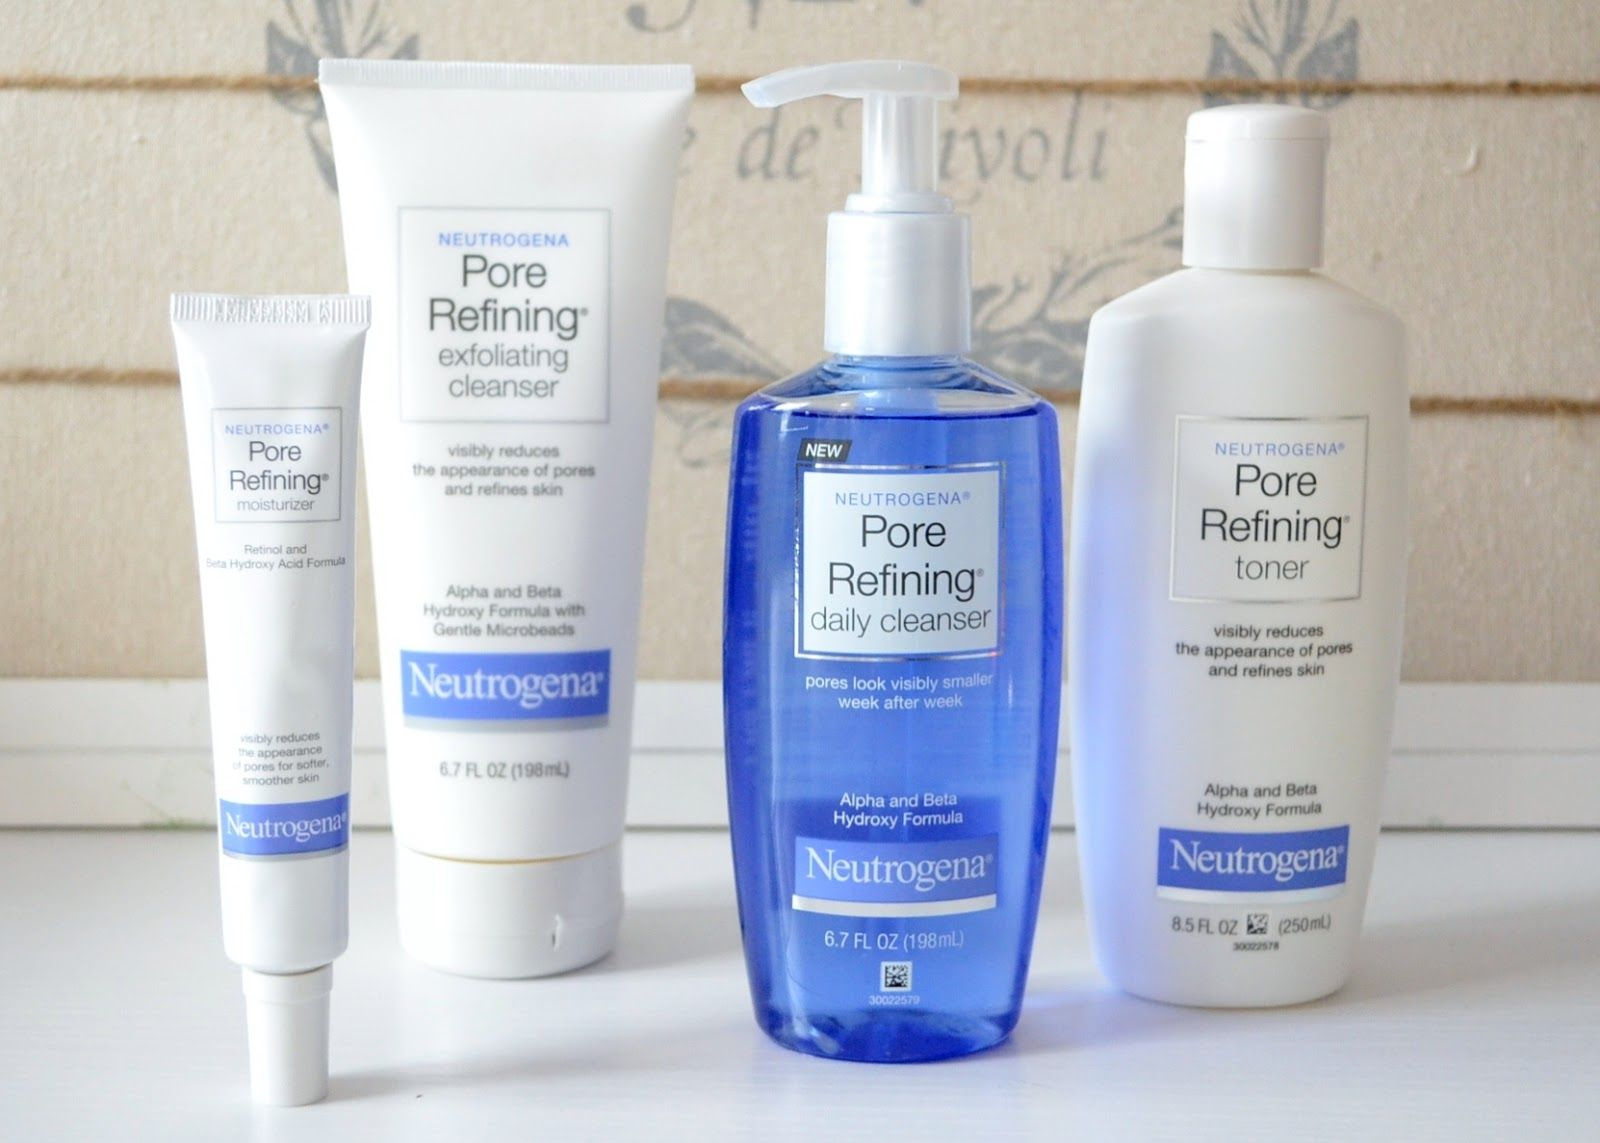 Neutrogena Skin Care Neutrogena Skin Care Regimen